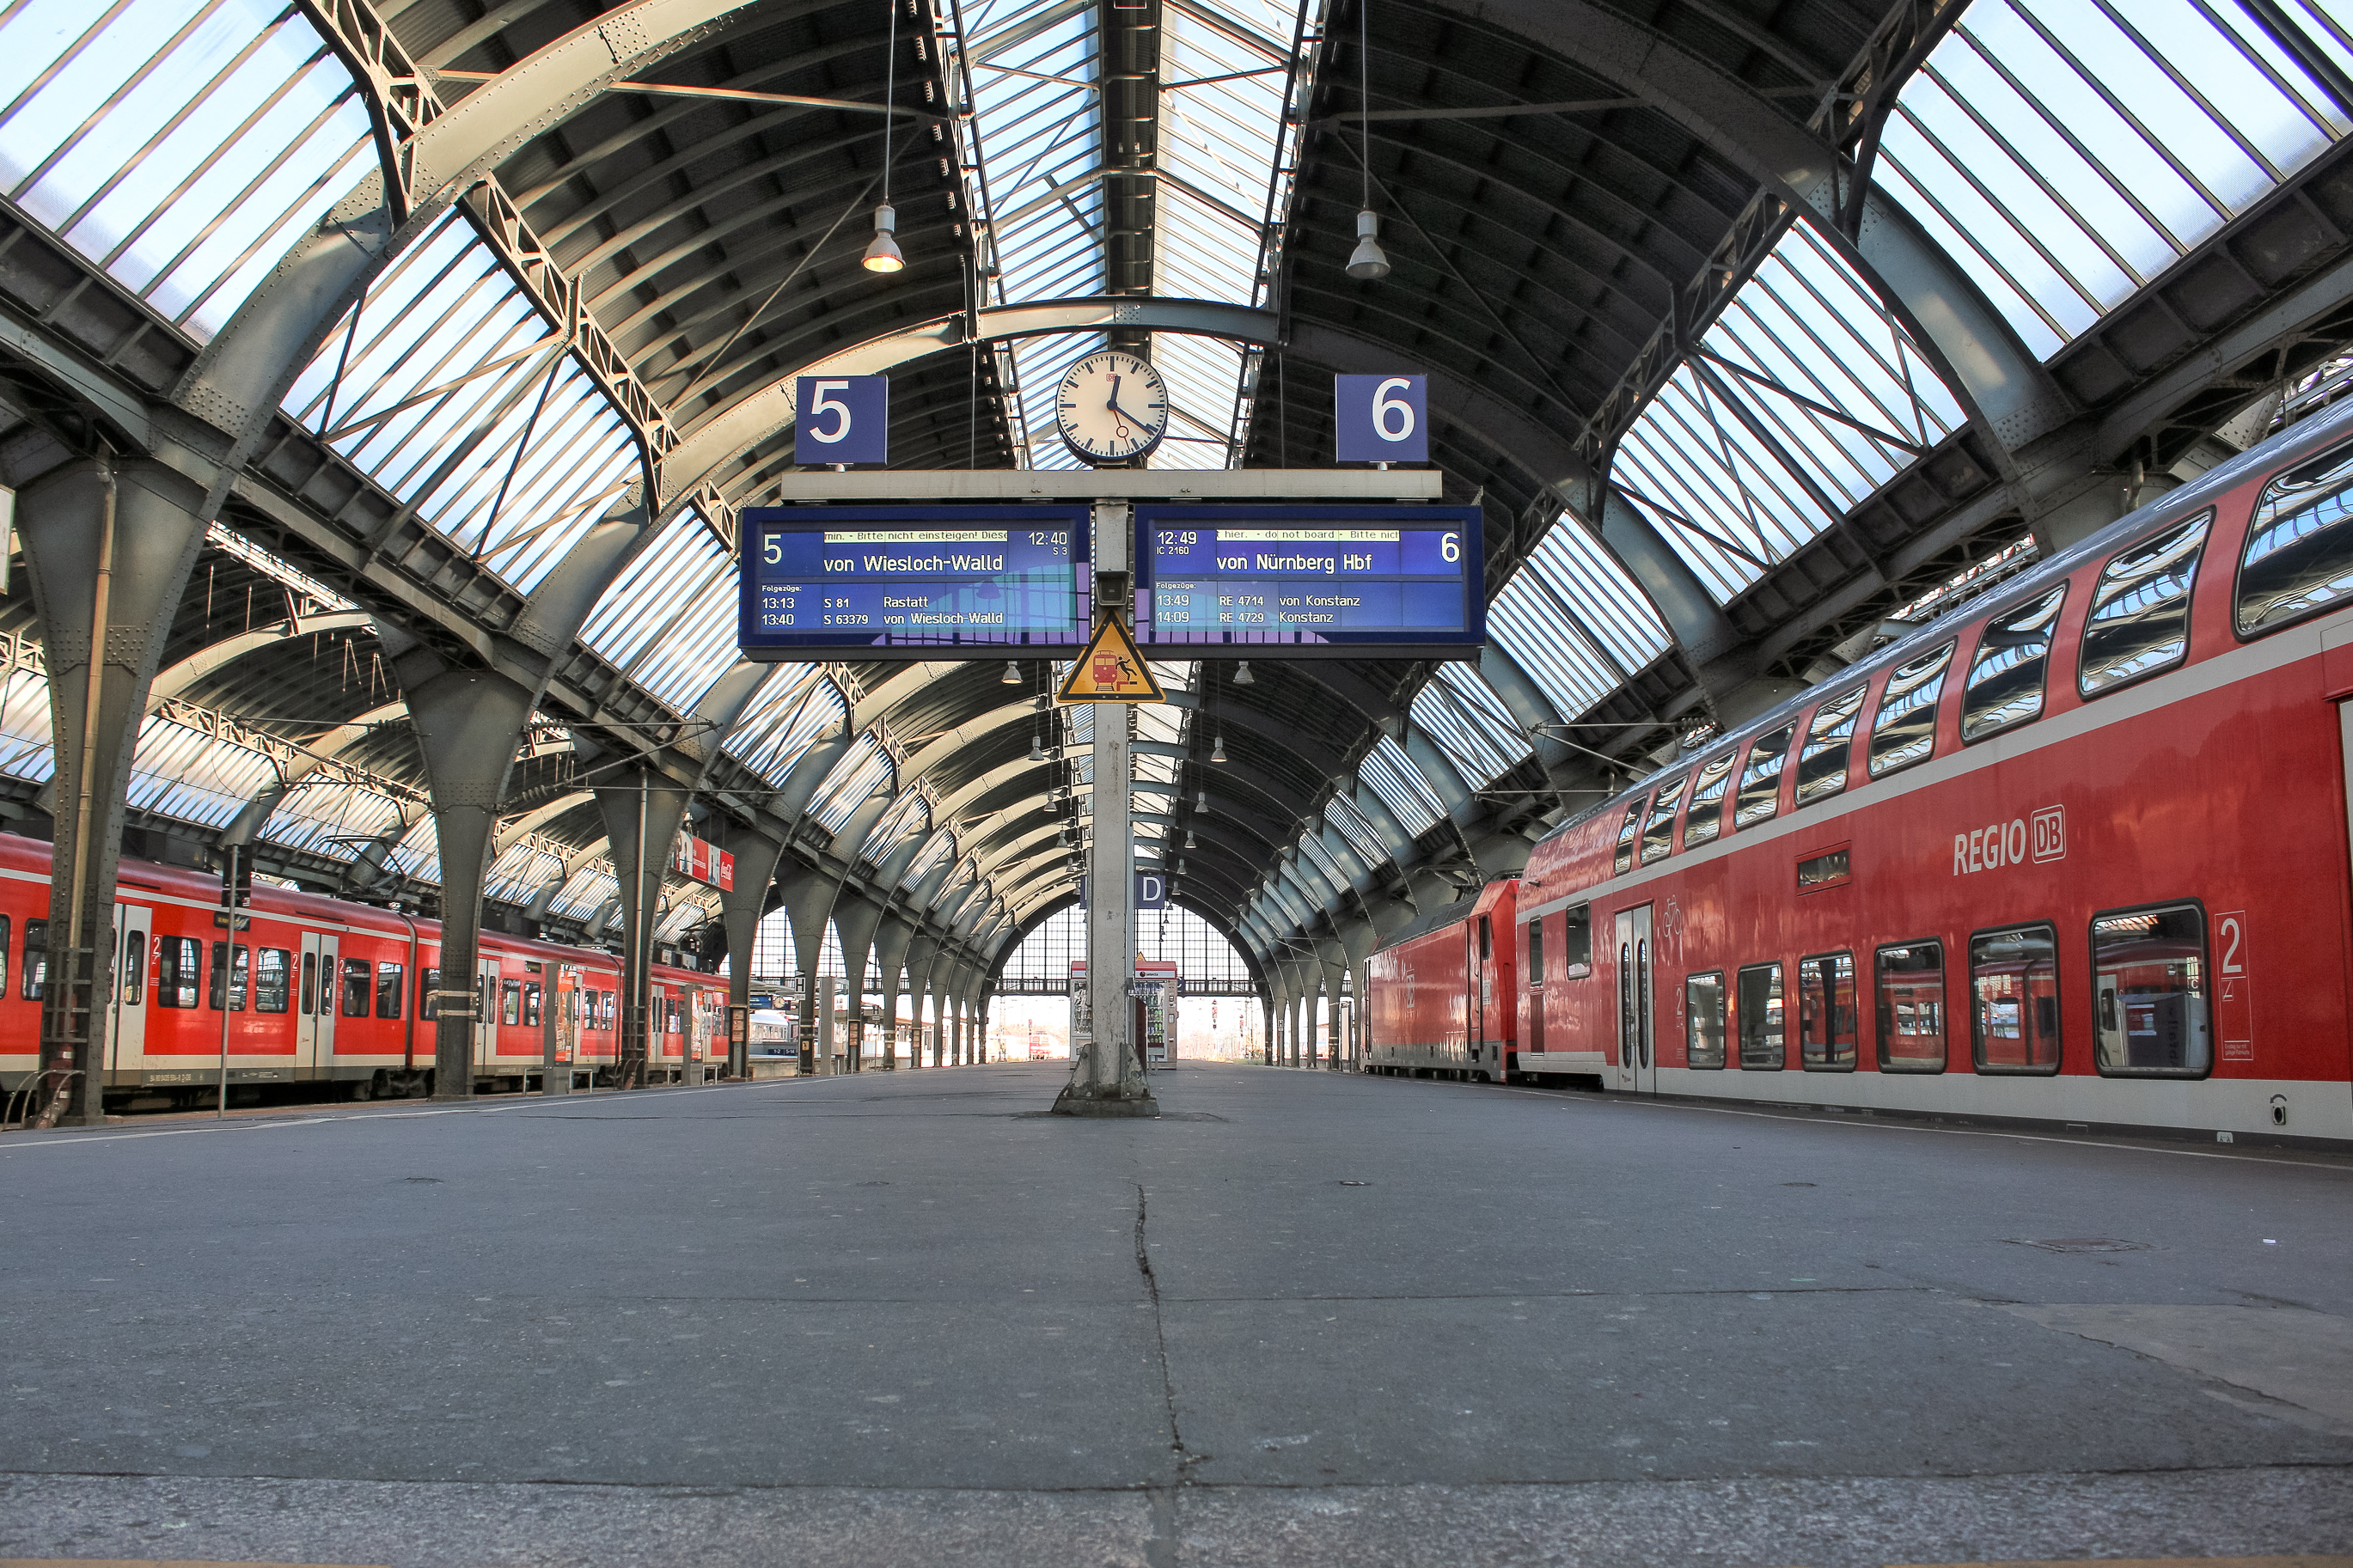 Hauptbahnhof Karlsruhe Zuge Bahnen Reisende Meinka